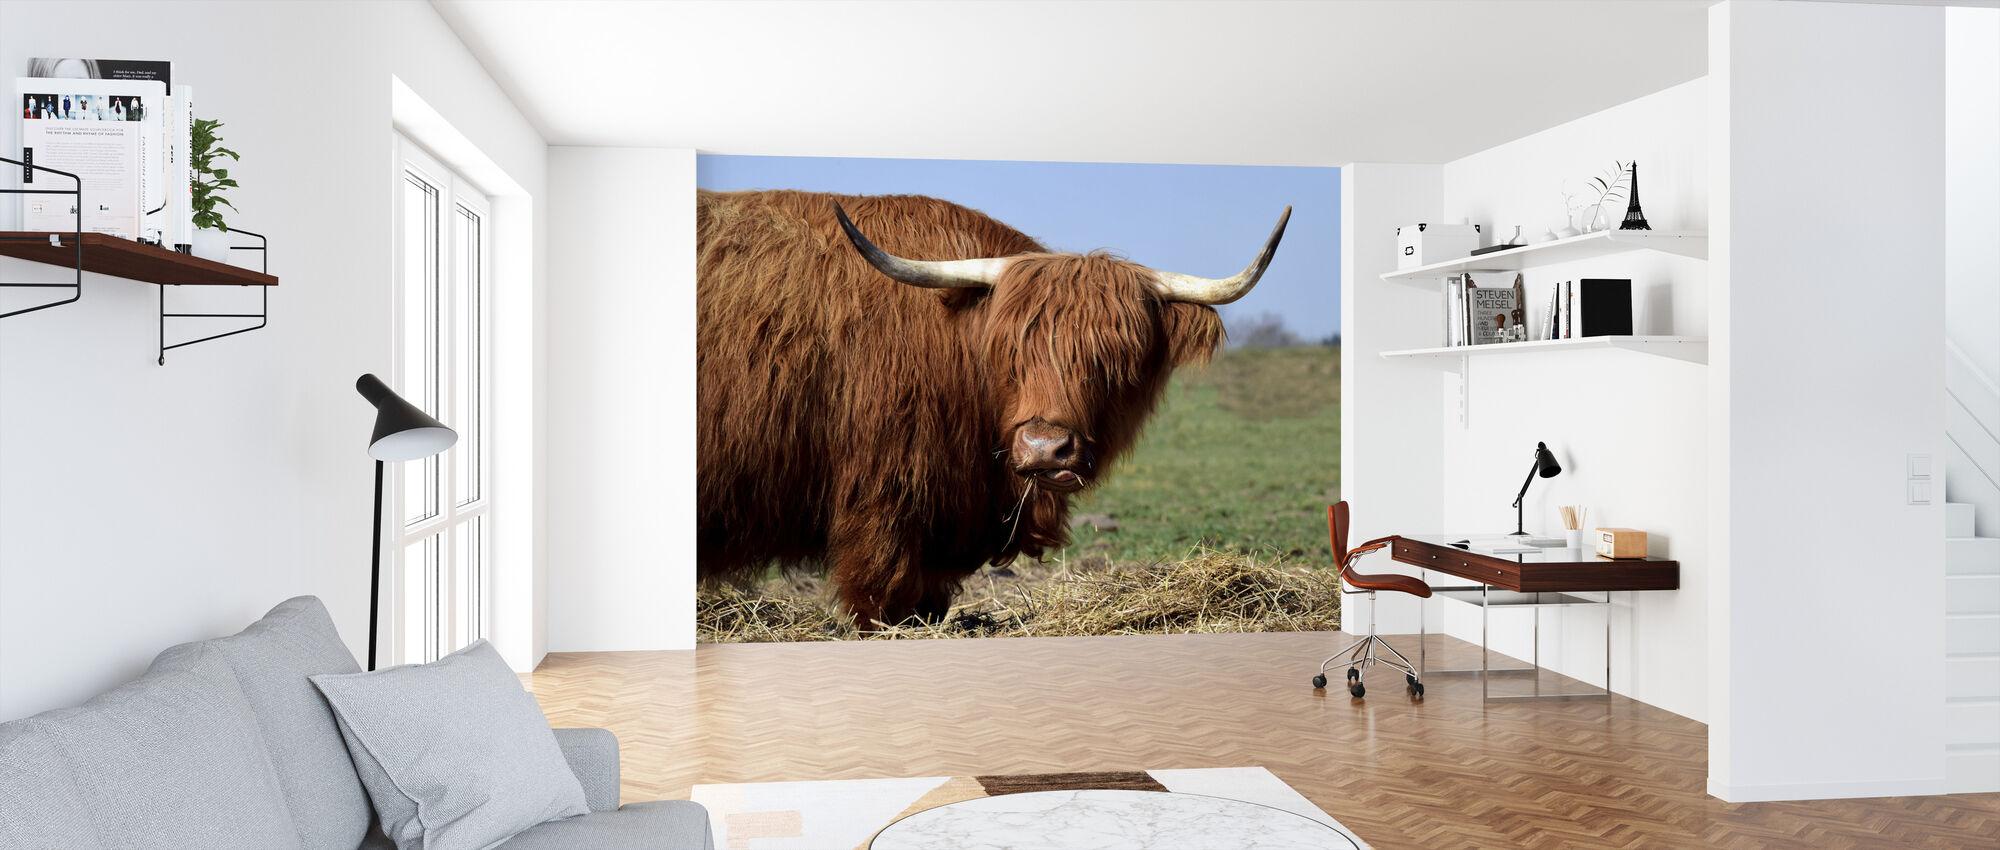 Galloway - Wallpaper - Office